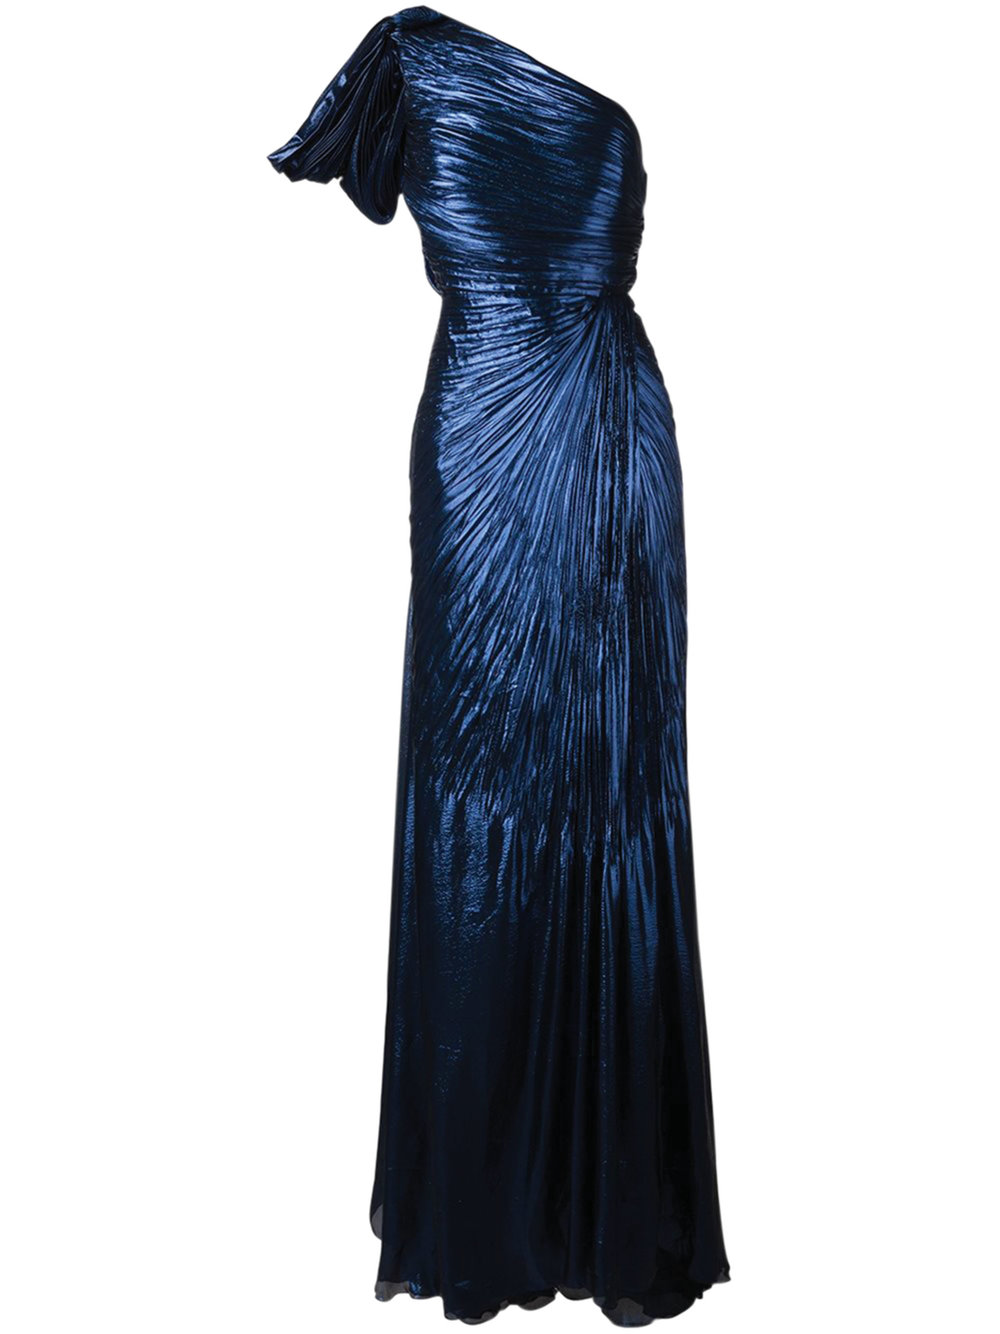 9.Maria Lucia Hohan 長裙 $5,485, farfetch.ca